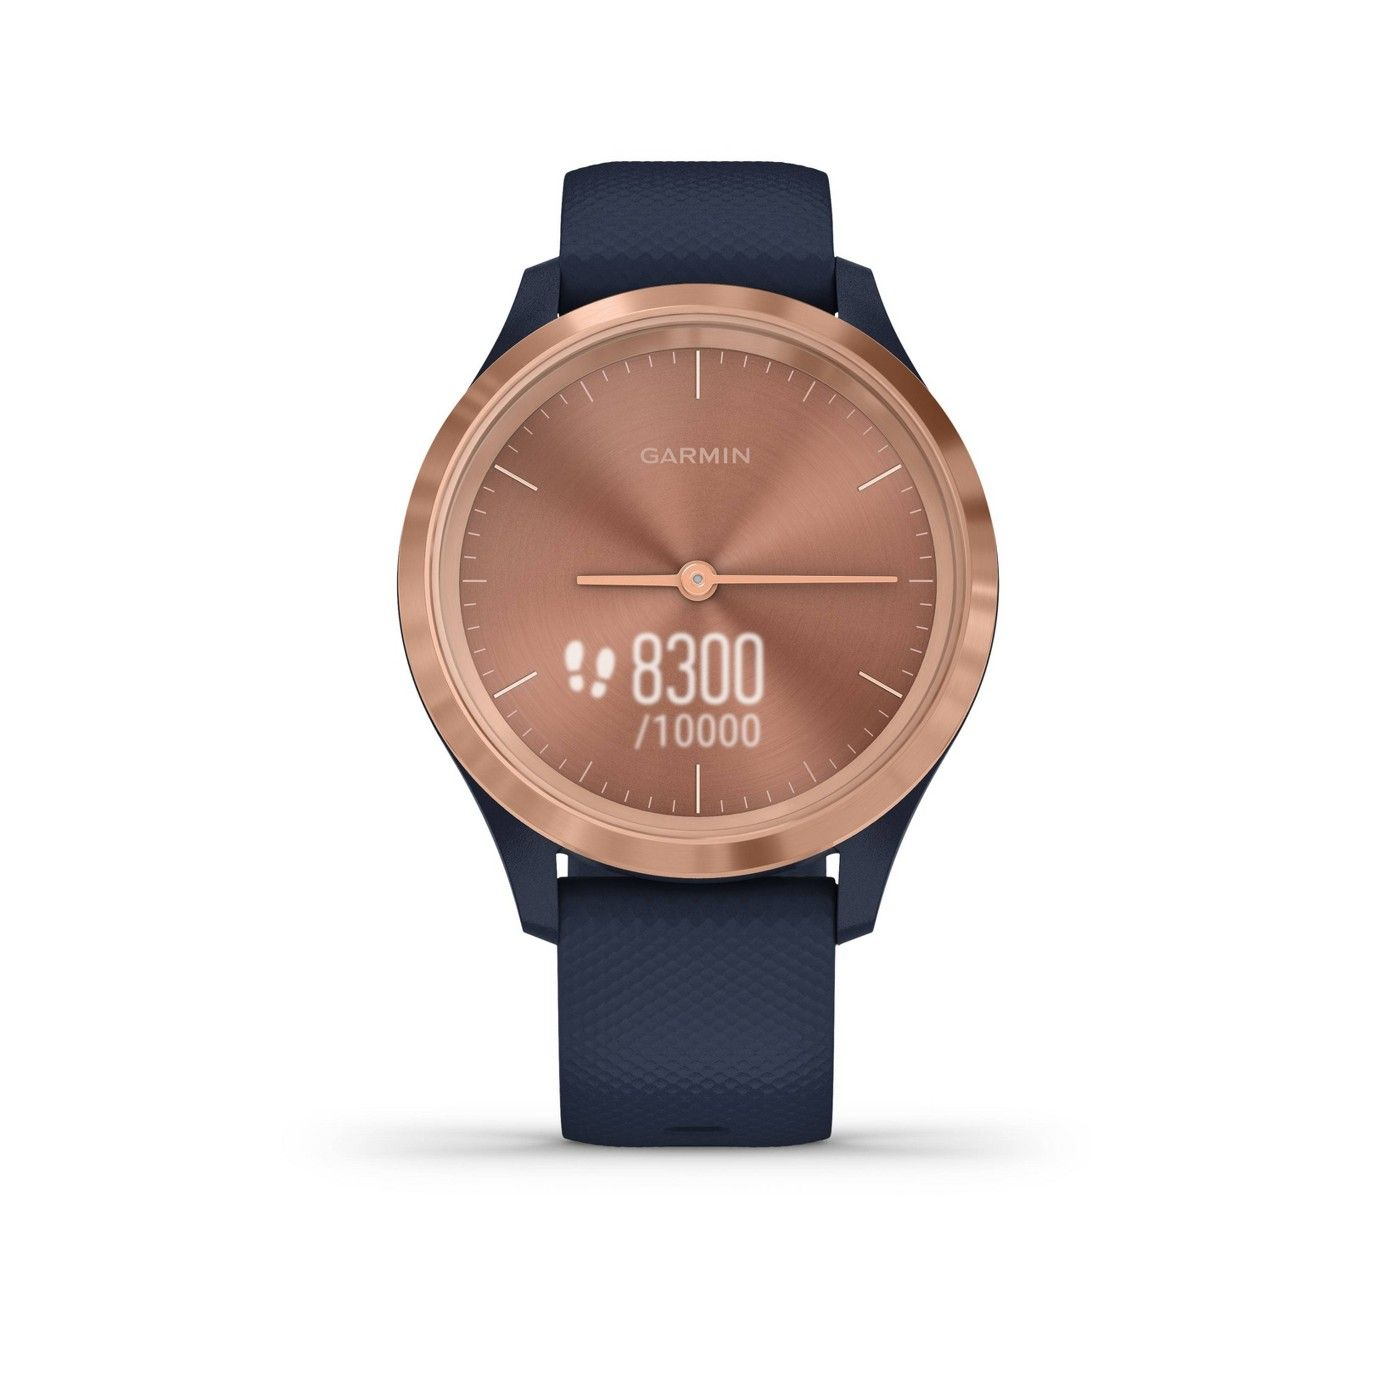 Garmin vivomove 3S Smartwatch #Sponsored #Garmin, #Ad, #vivomove, #Smartwatch